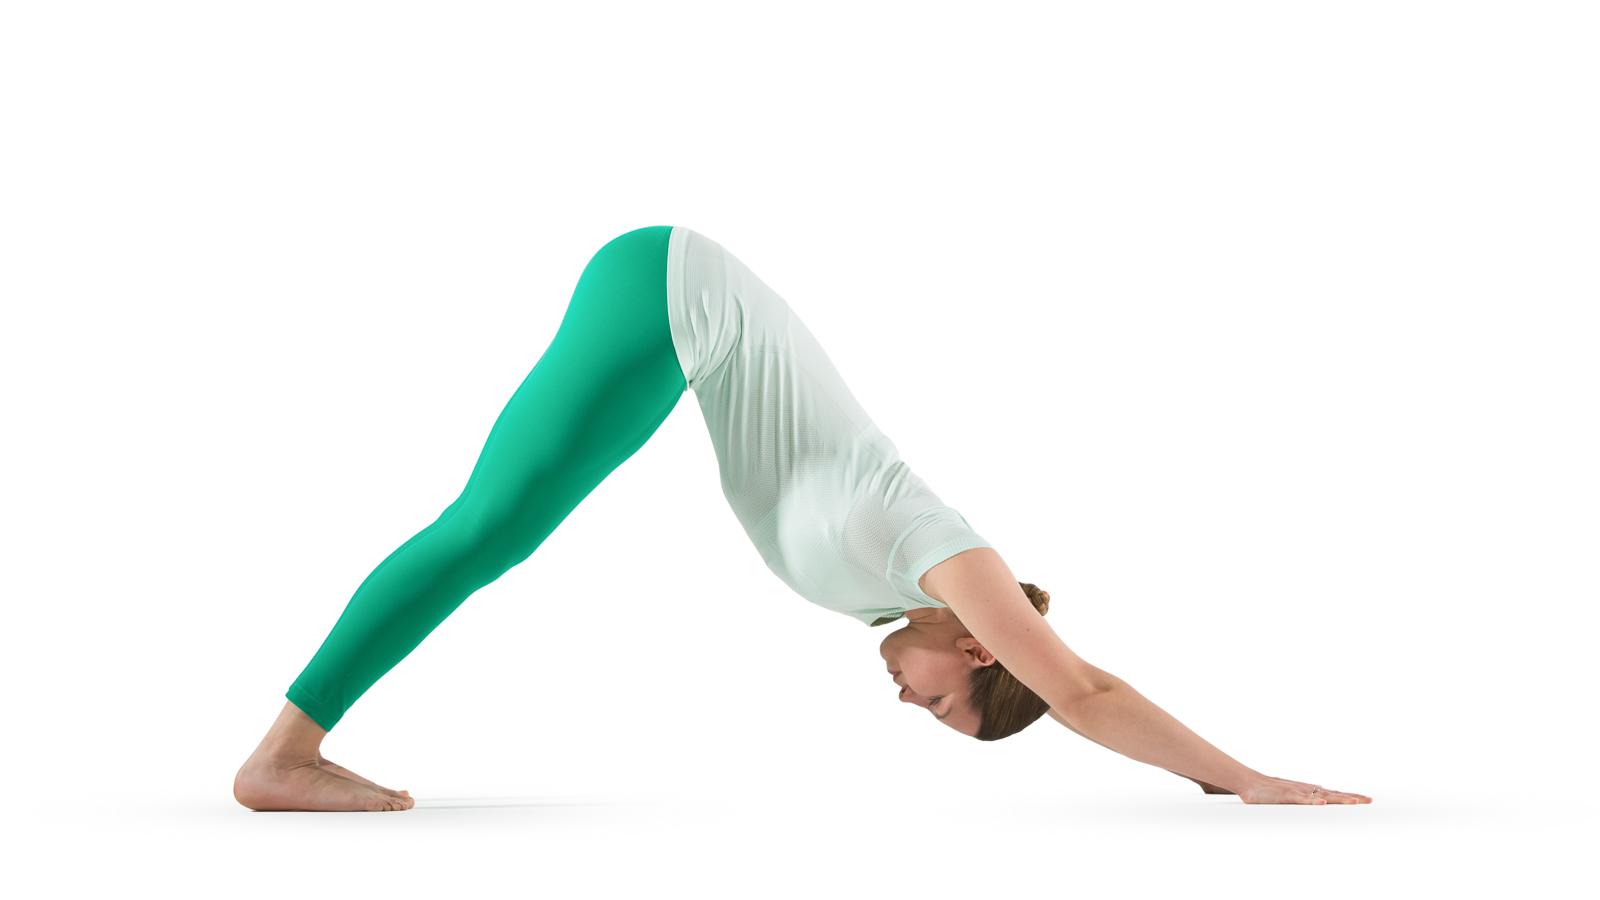 image of downward dog yoga pose